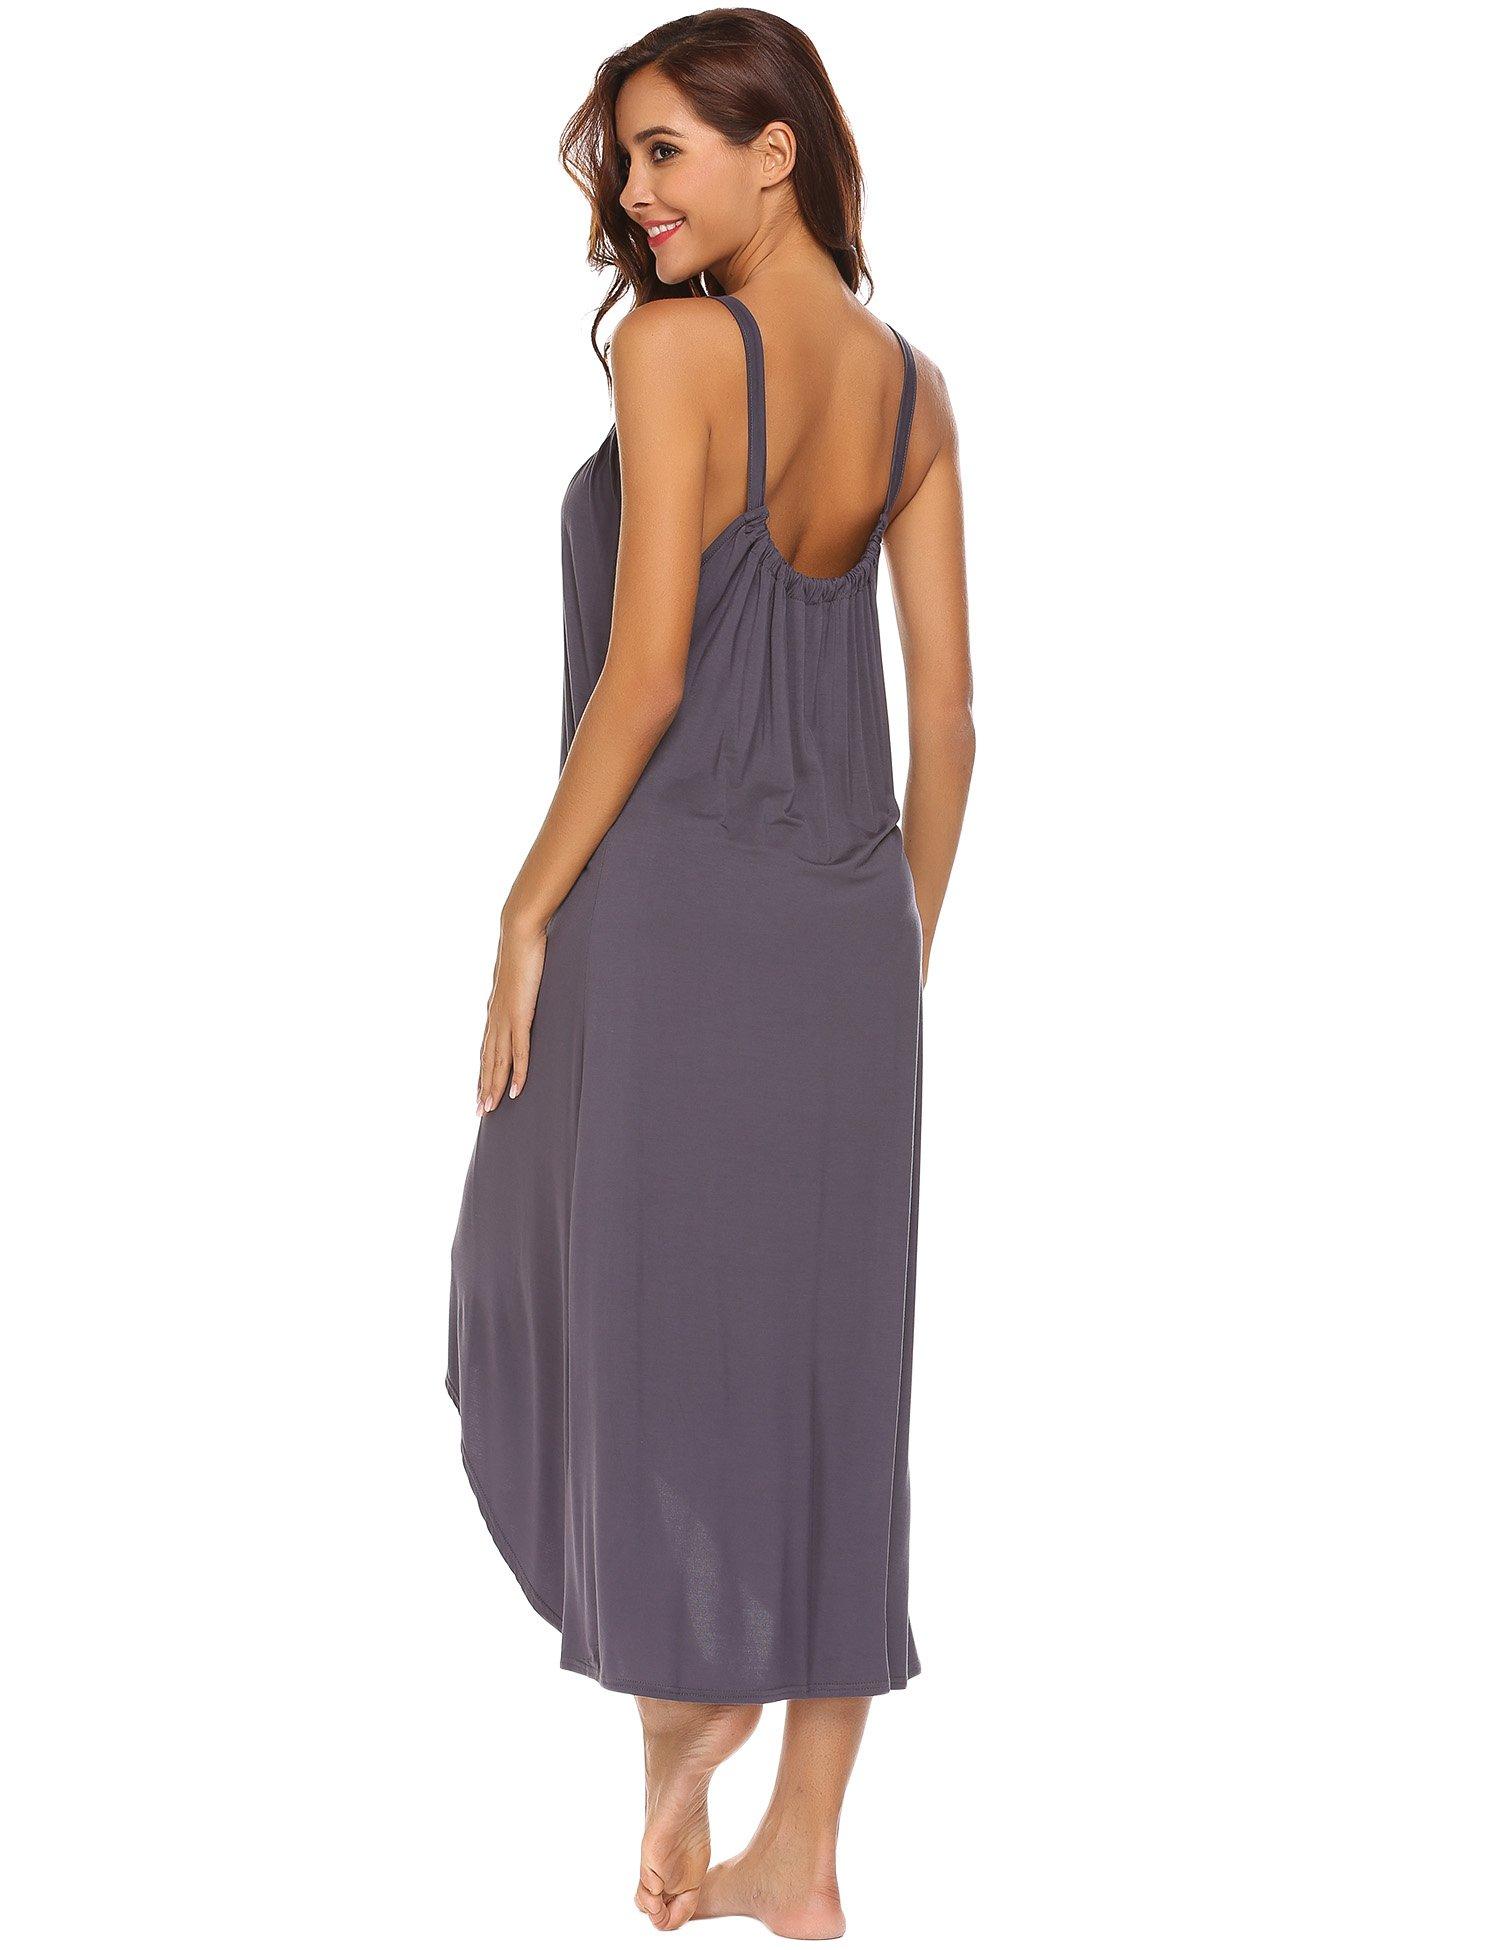 Ekouaer Womens Sleeveless Long Nightgown Summer Slip Night Dress Cotton Sleepshirt Chemise,A-dark Grey_6696,Small by Ekouaer (Image #5)